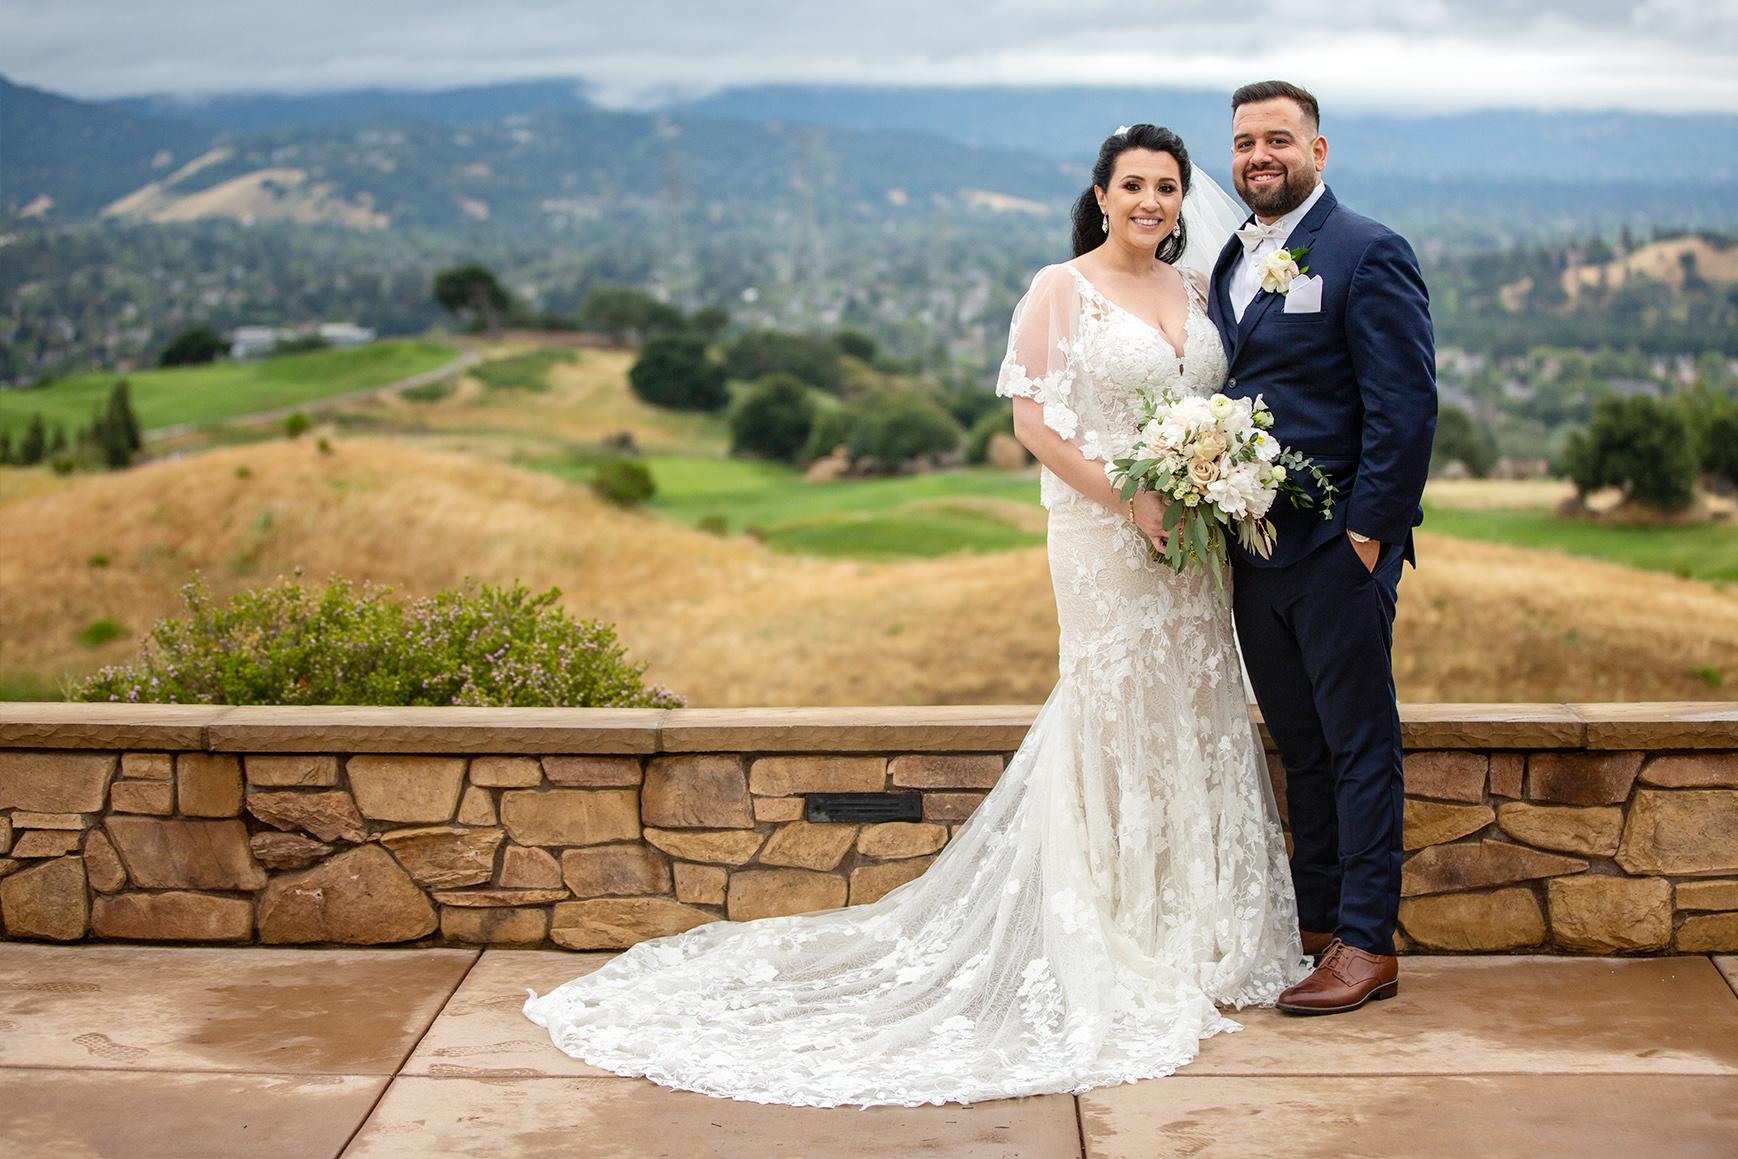 Stunning locations for your romantic portraits - Boulder Ridge - Los Gatos, California - San Jose, California - Santa Clara County - Wedgewood Weddings